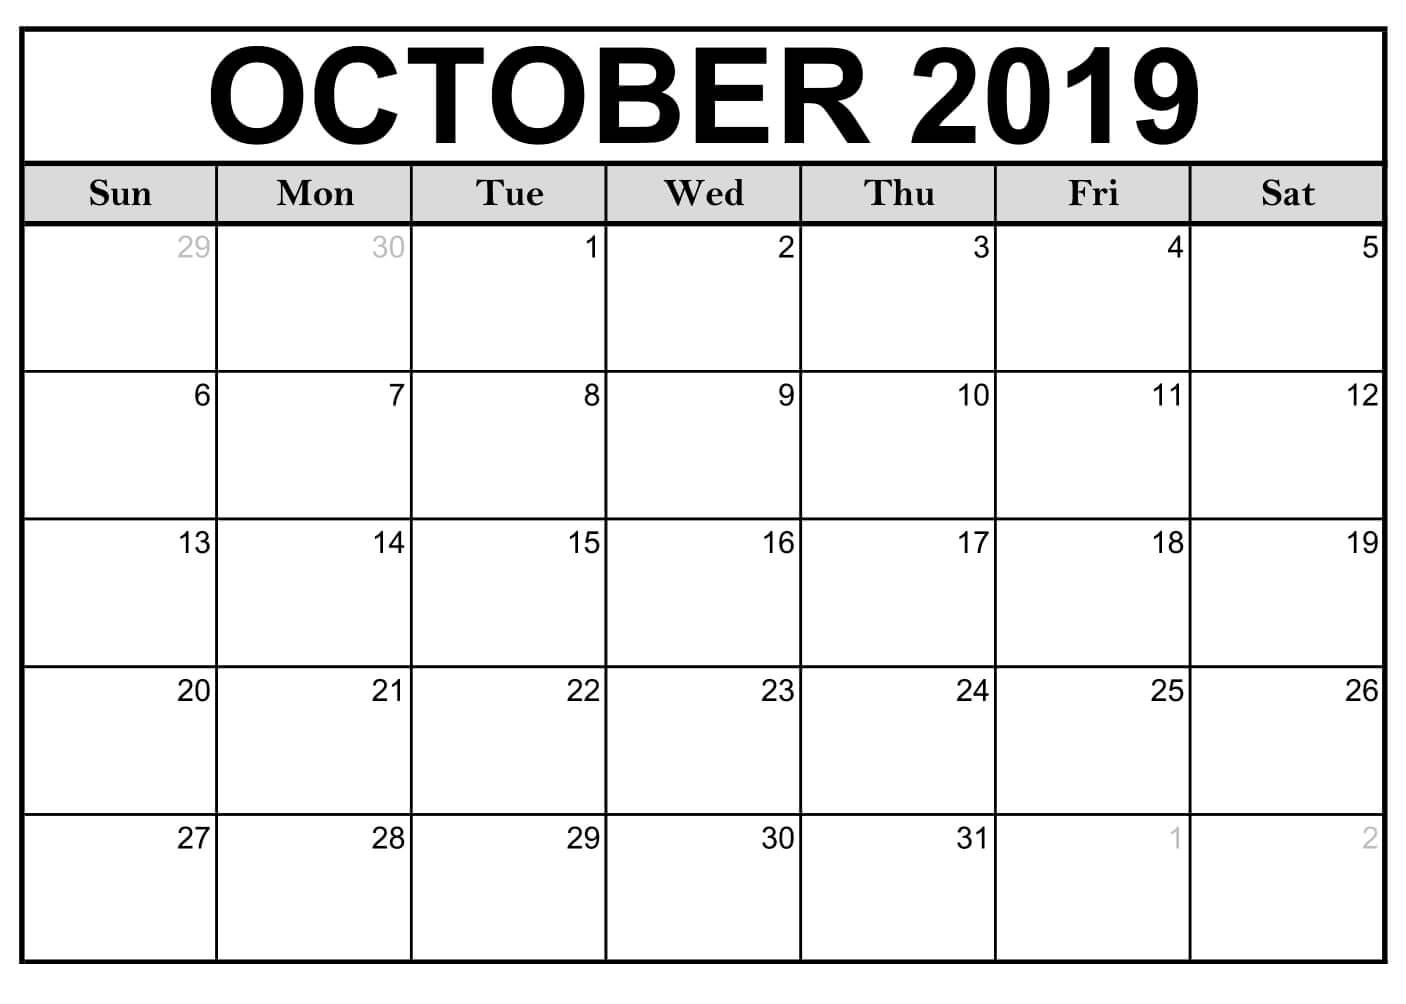 Blank October 2019 Calendar Printable Template  Latest throughout Google Calendar Printable Template